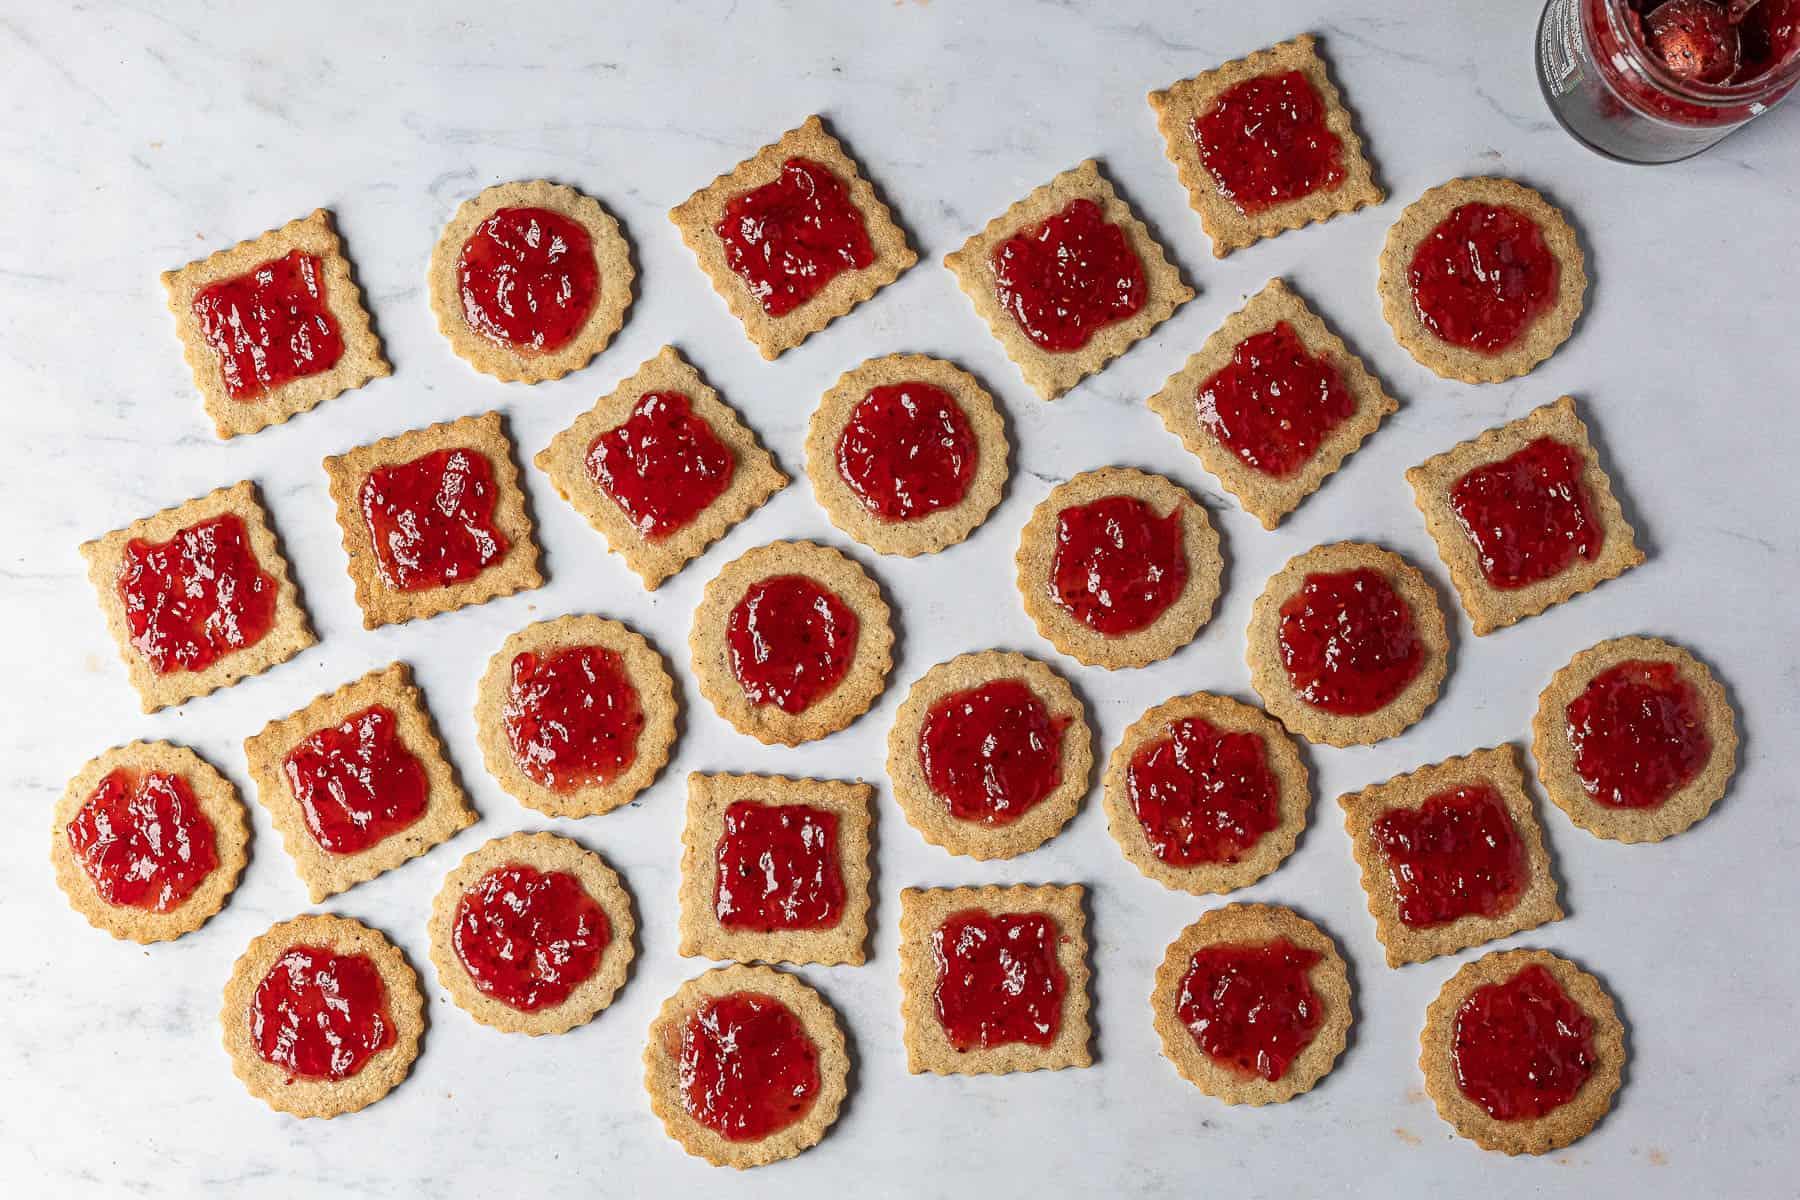 The jam coated bottom cookie halves.